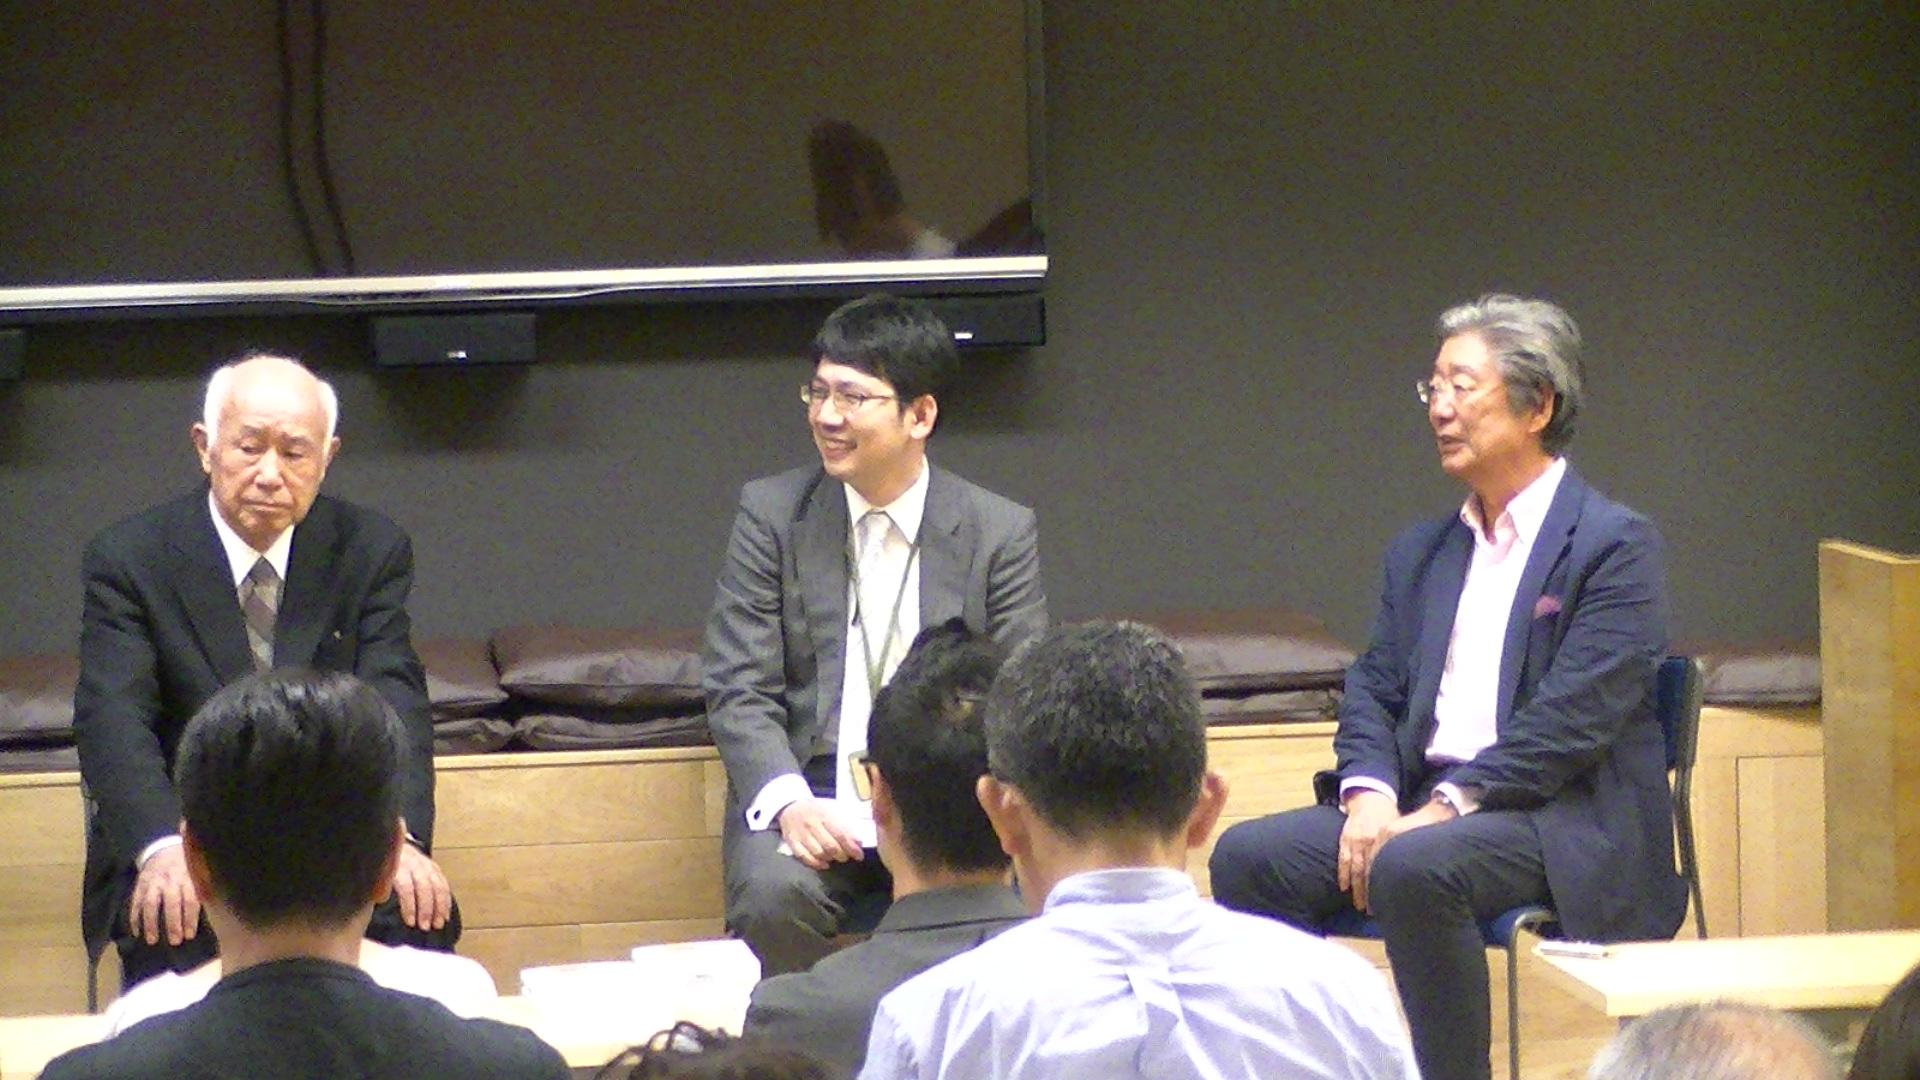 PIC 0033 - 4月1日東京思風塾の開催になります。